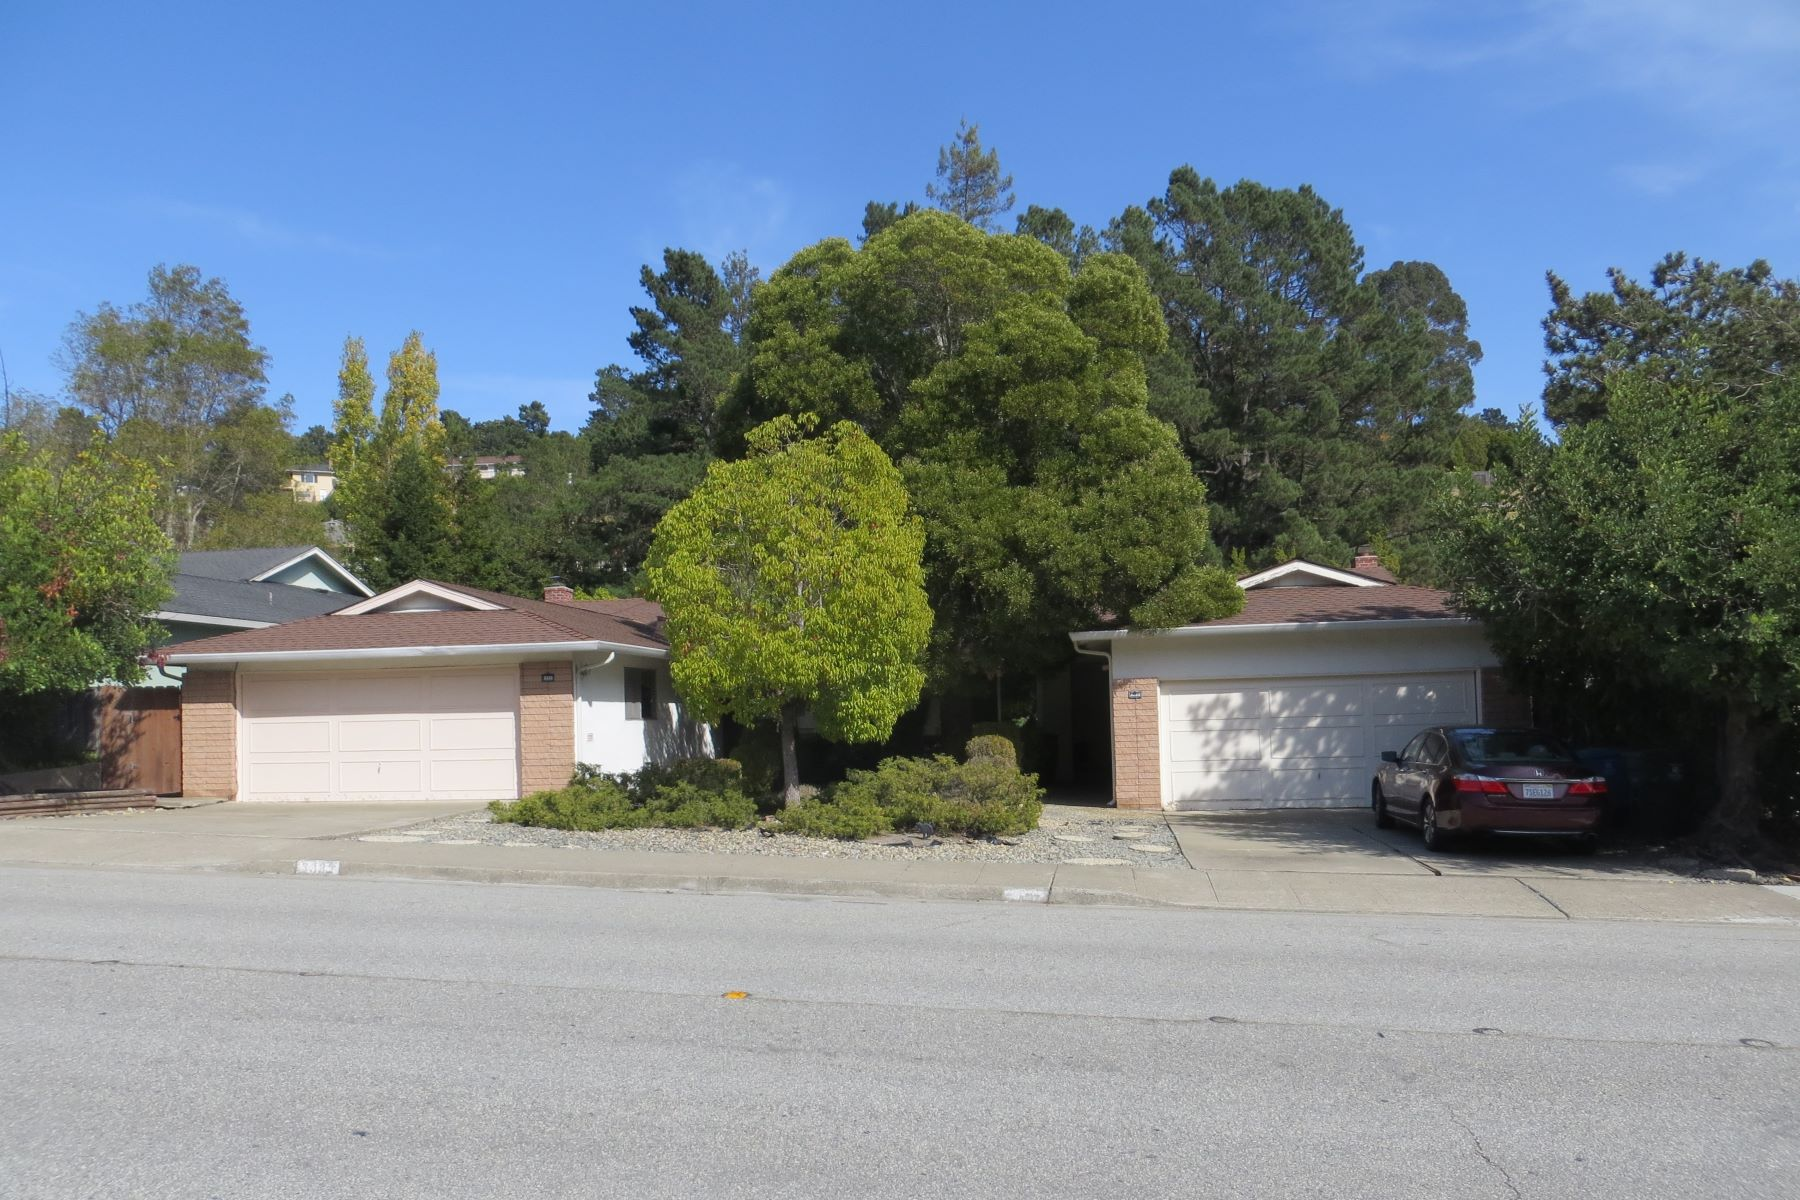 Duplex Homes 为 销售 在 Fabulous Duplex in Desirable Neighborhood 3333 - 3335 Glendora Drive 圣马特奥市, 加利福尼亚州 94403 美国